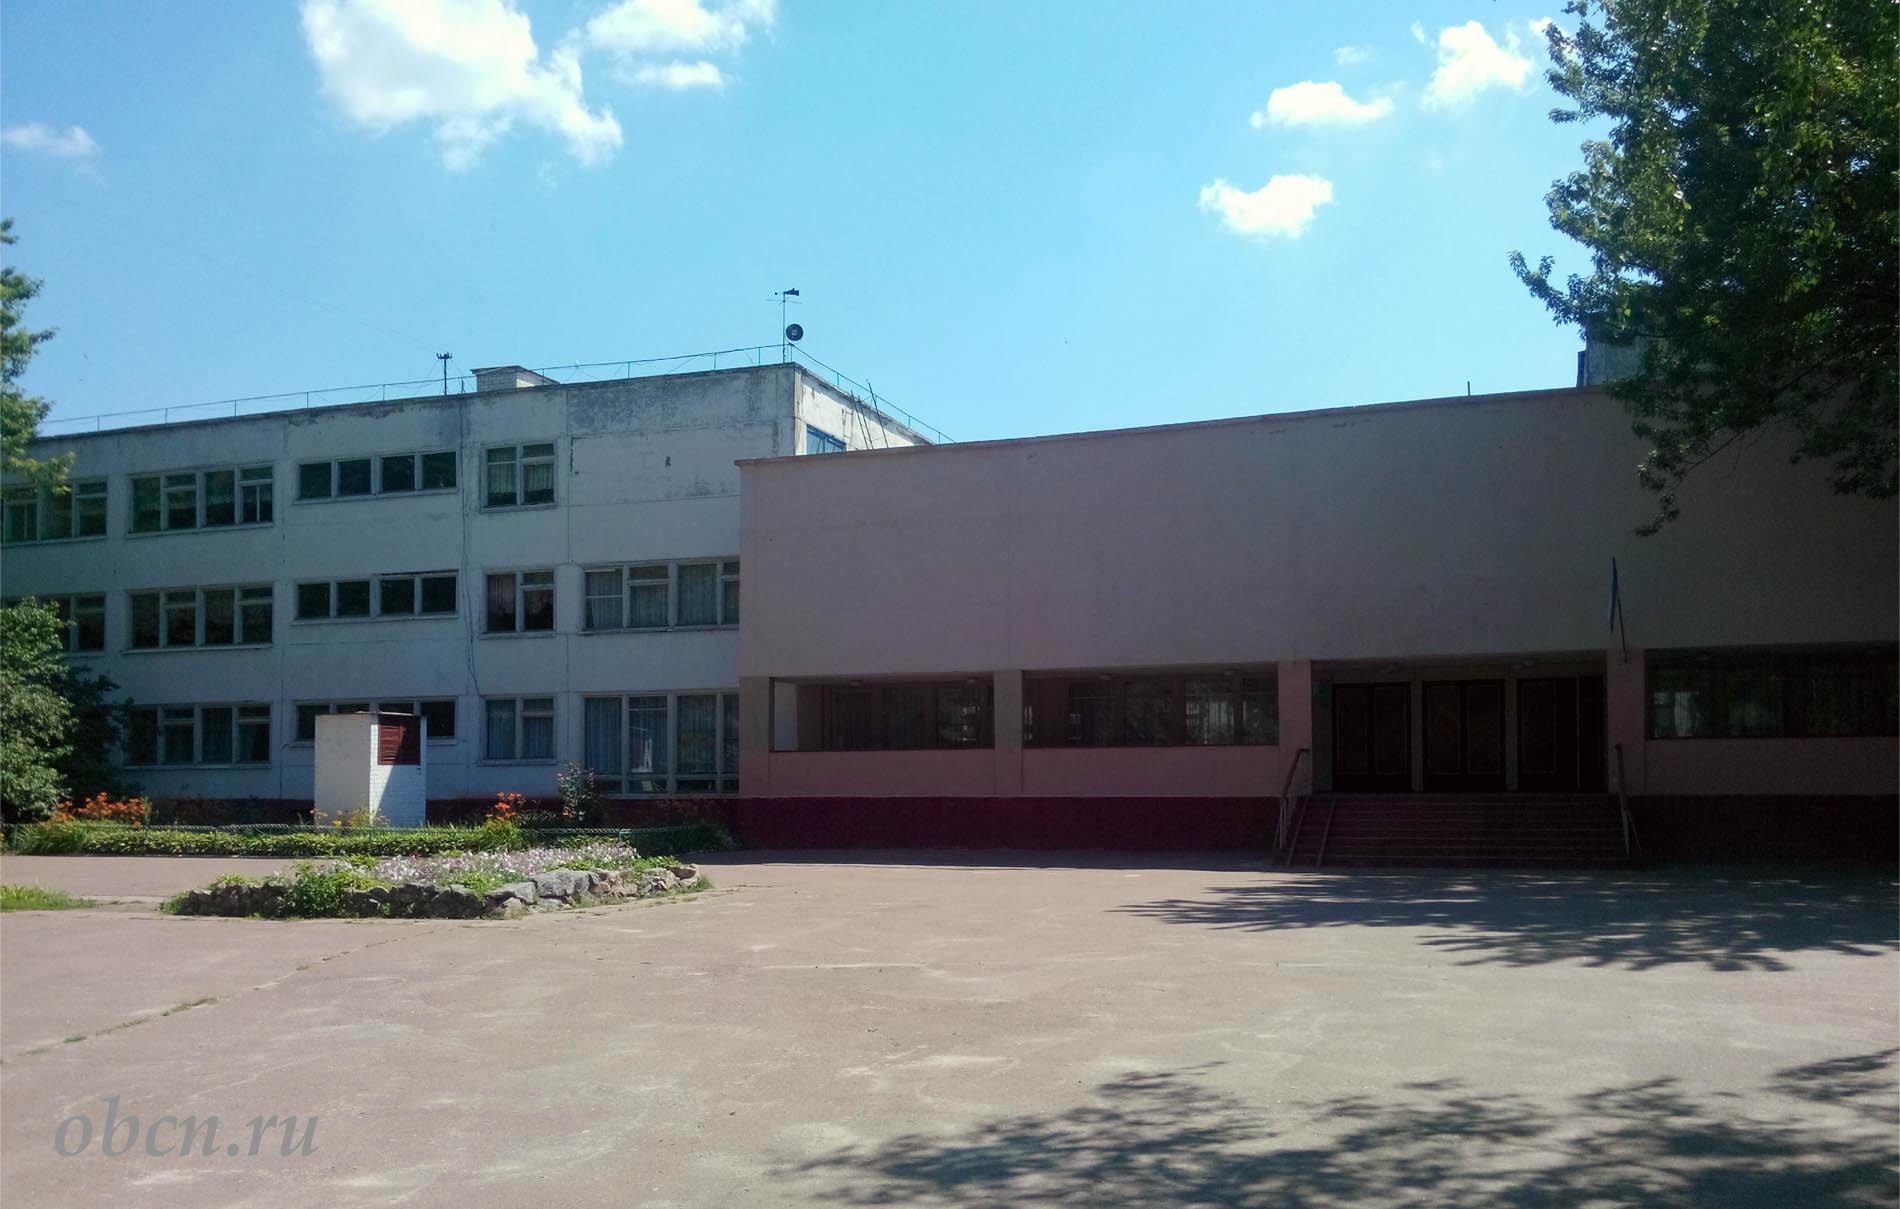 31-ая школа в Чернигове